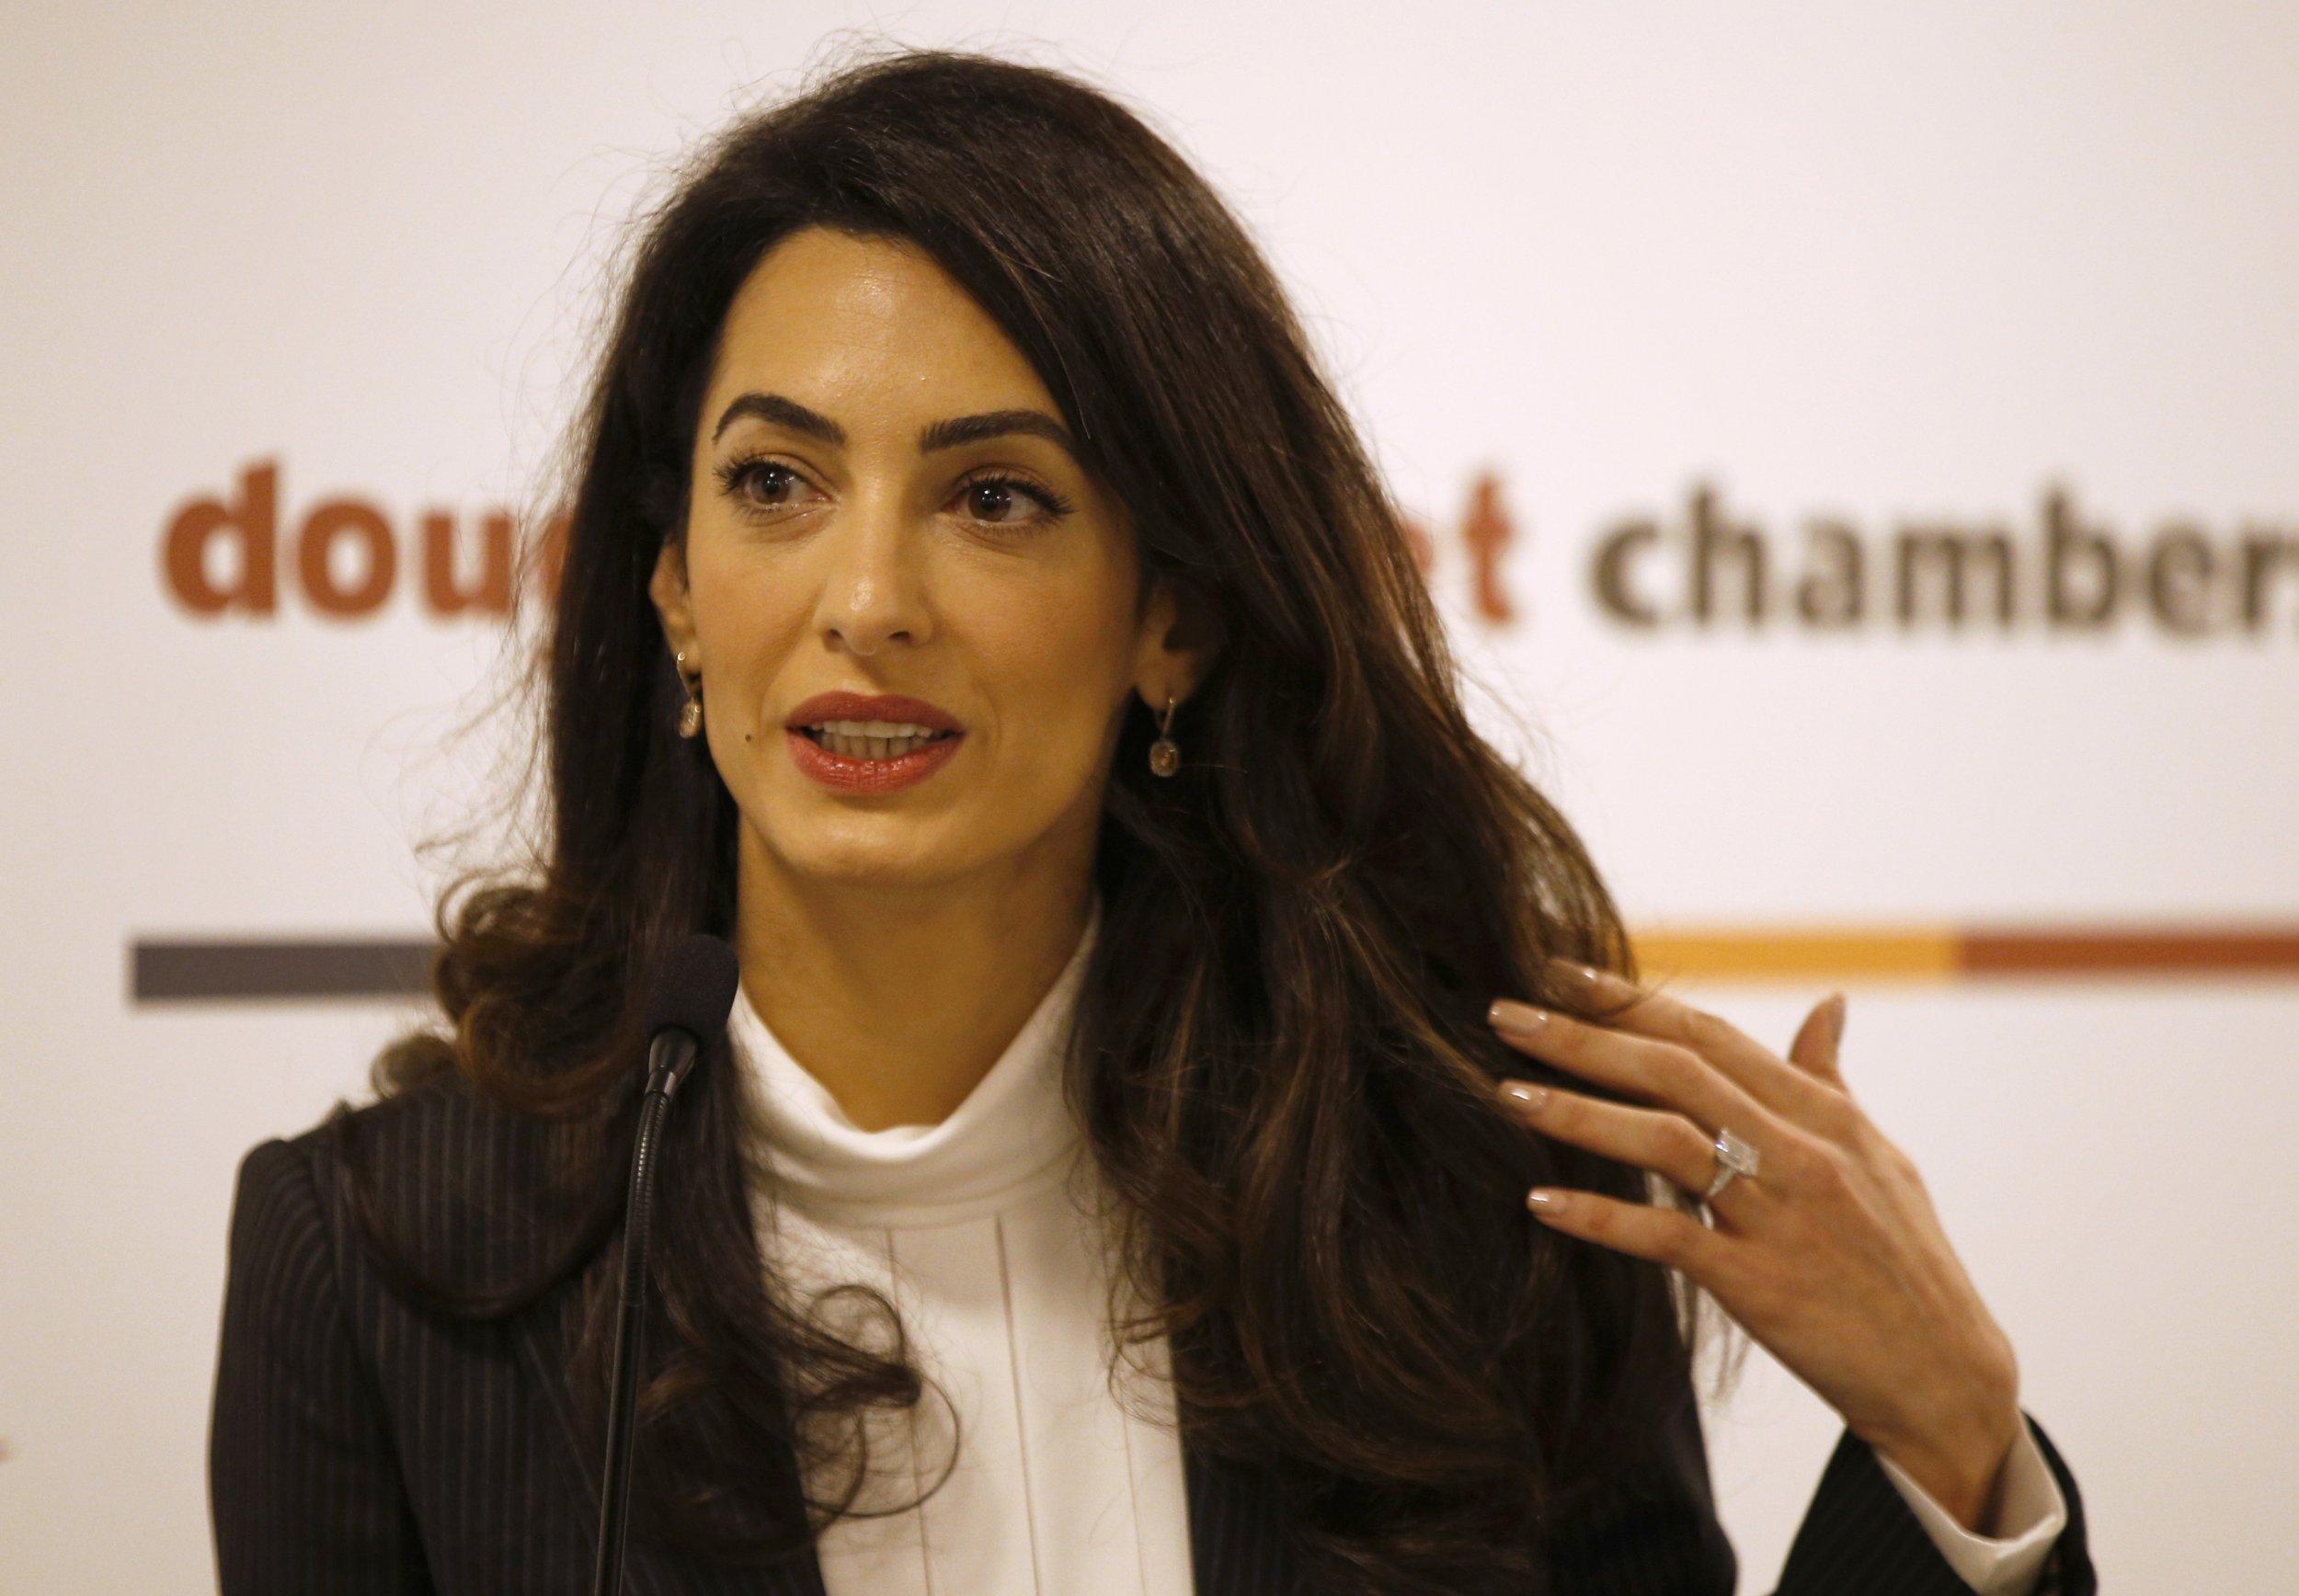 Nadia ali middle east sex arabic lebanese girl - 2 part 2